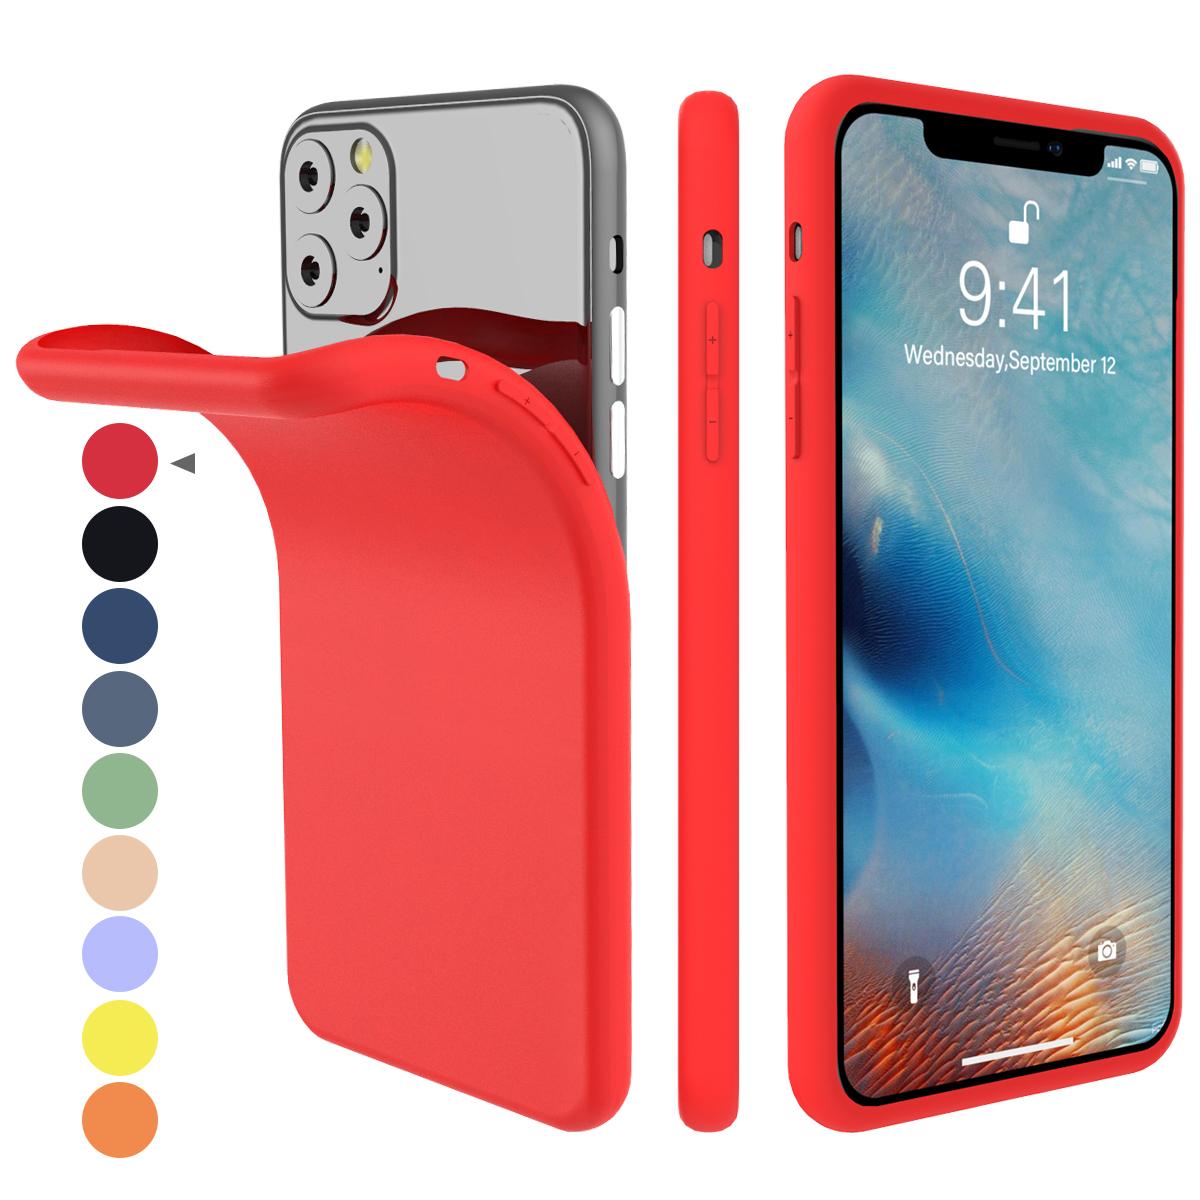 Torubia Silicone Case for iPhone 11/11 Pro/11 Pro Max 120